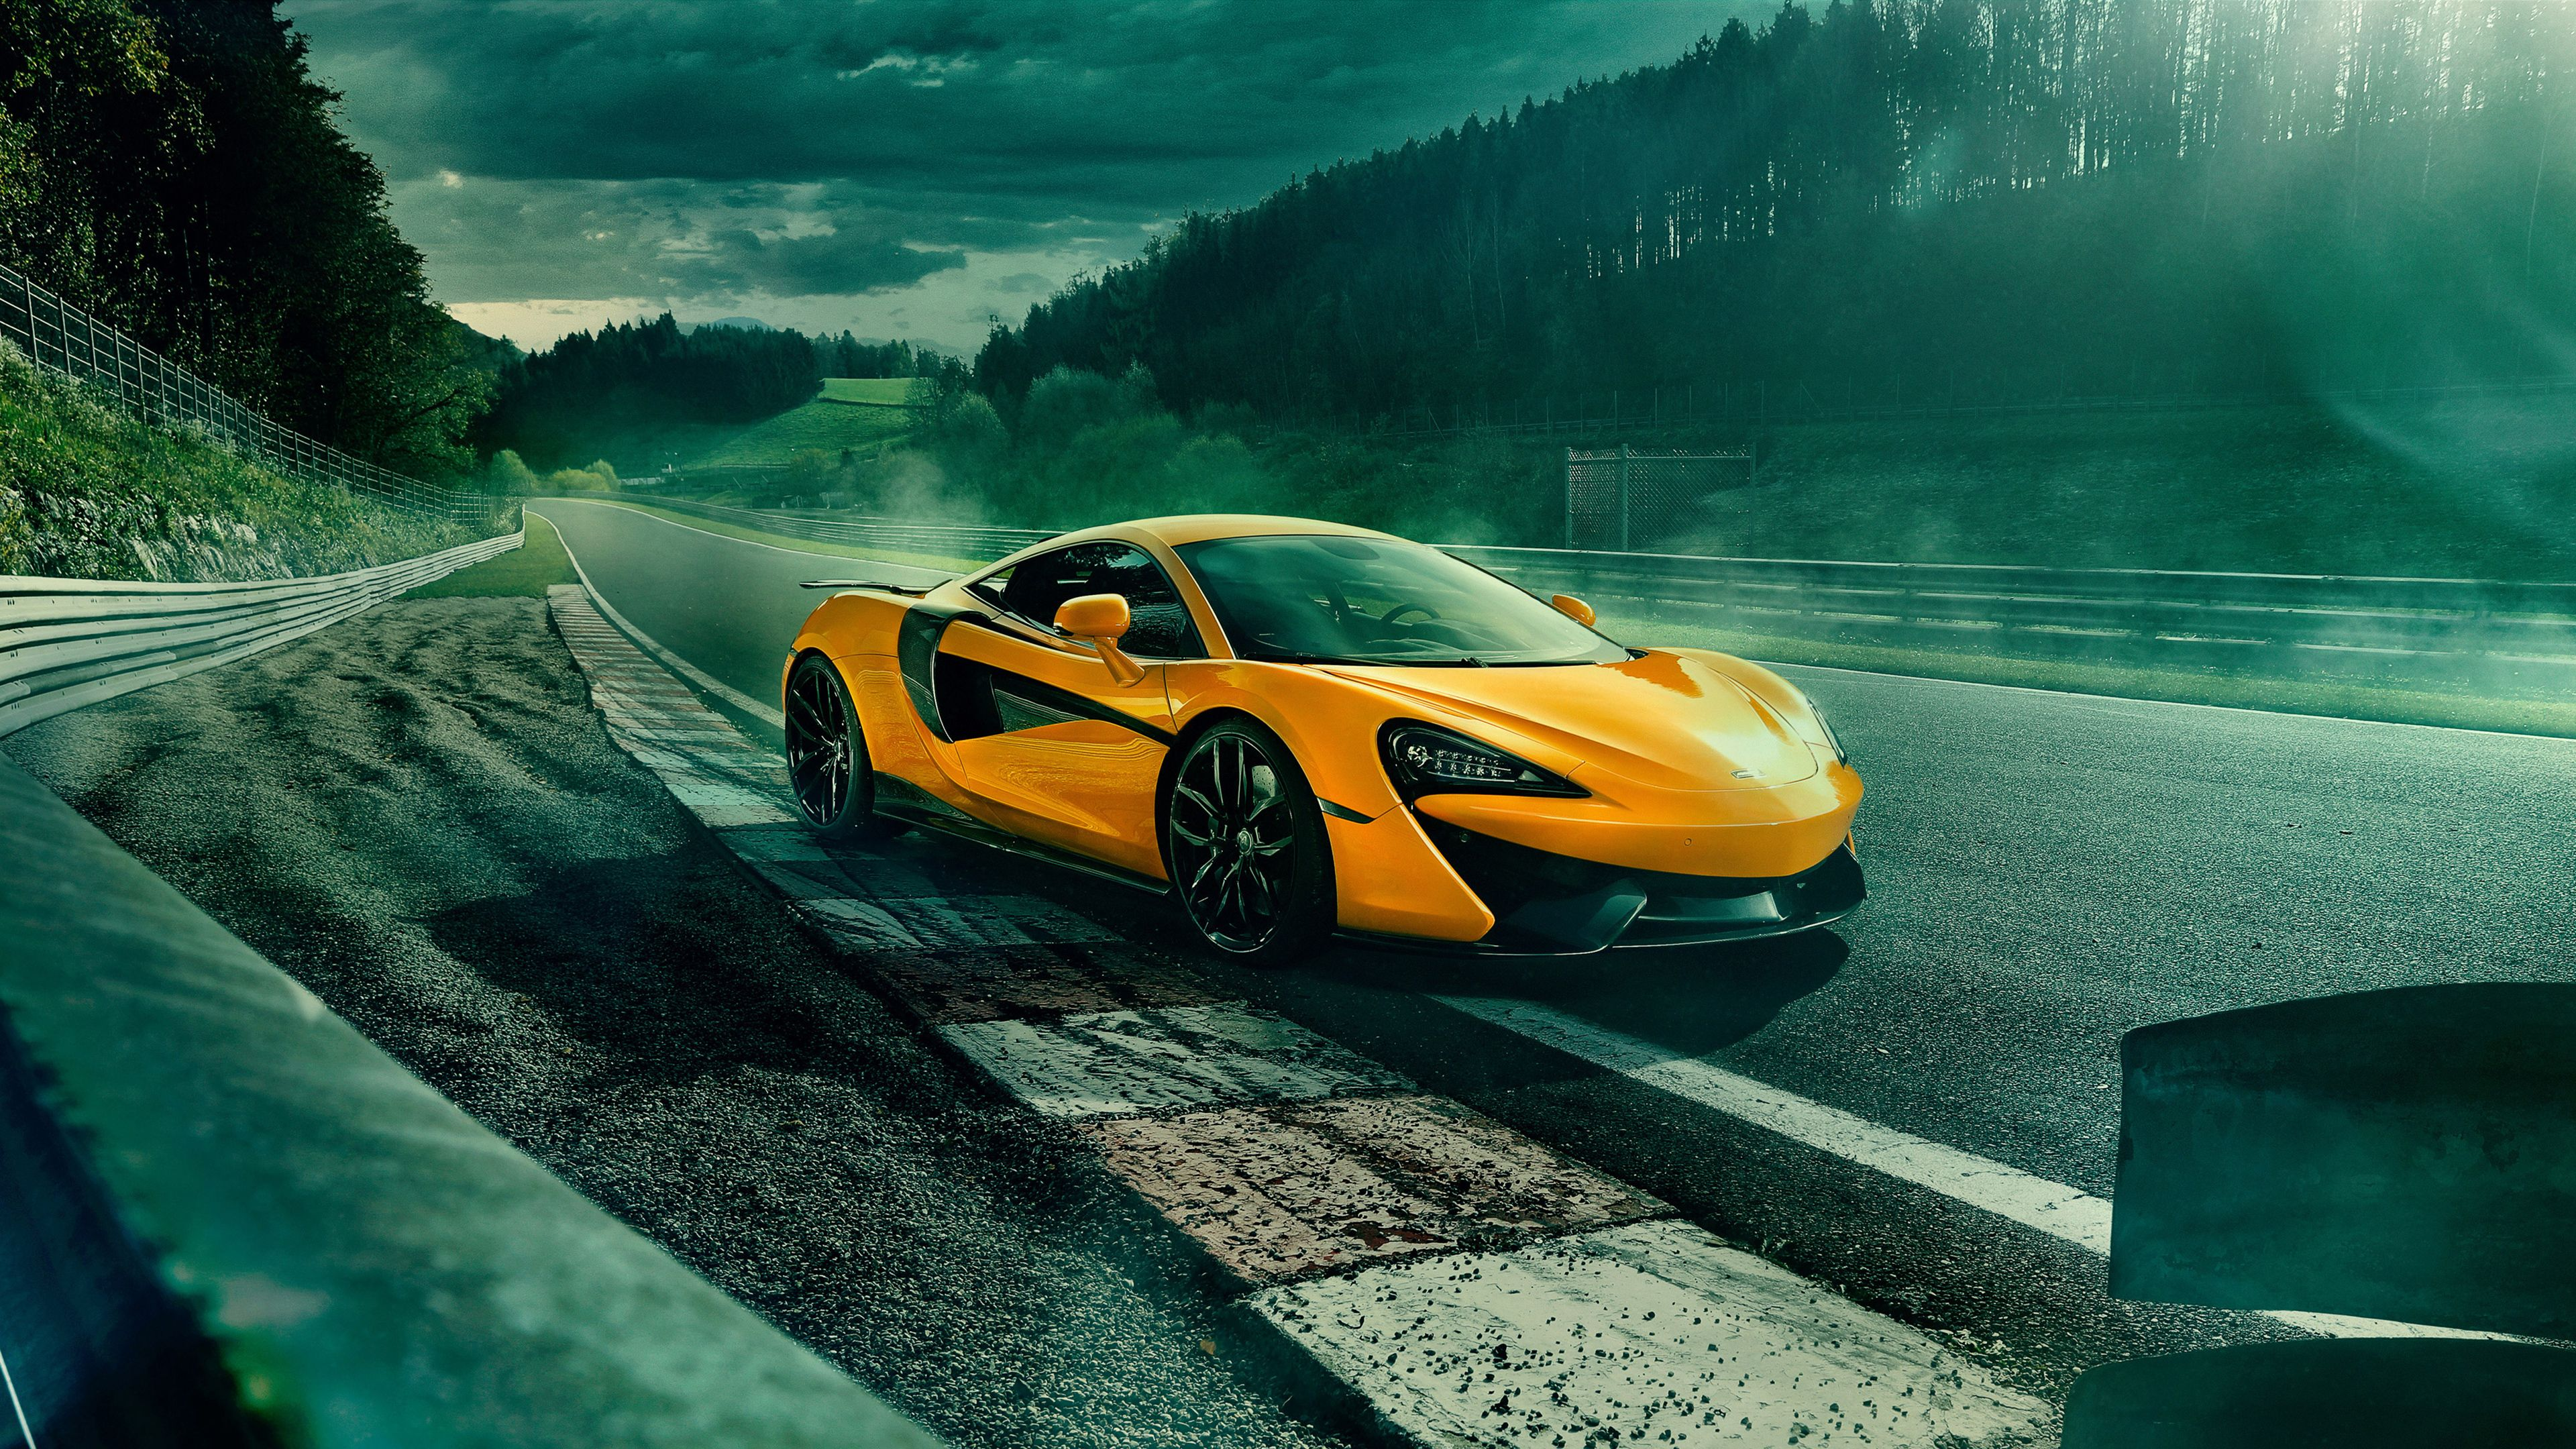 4K Ultra HD McLaren Wallpapers - Top Free 4K Ultra HD ...